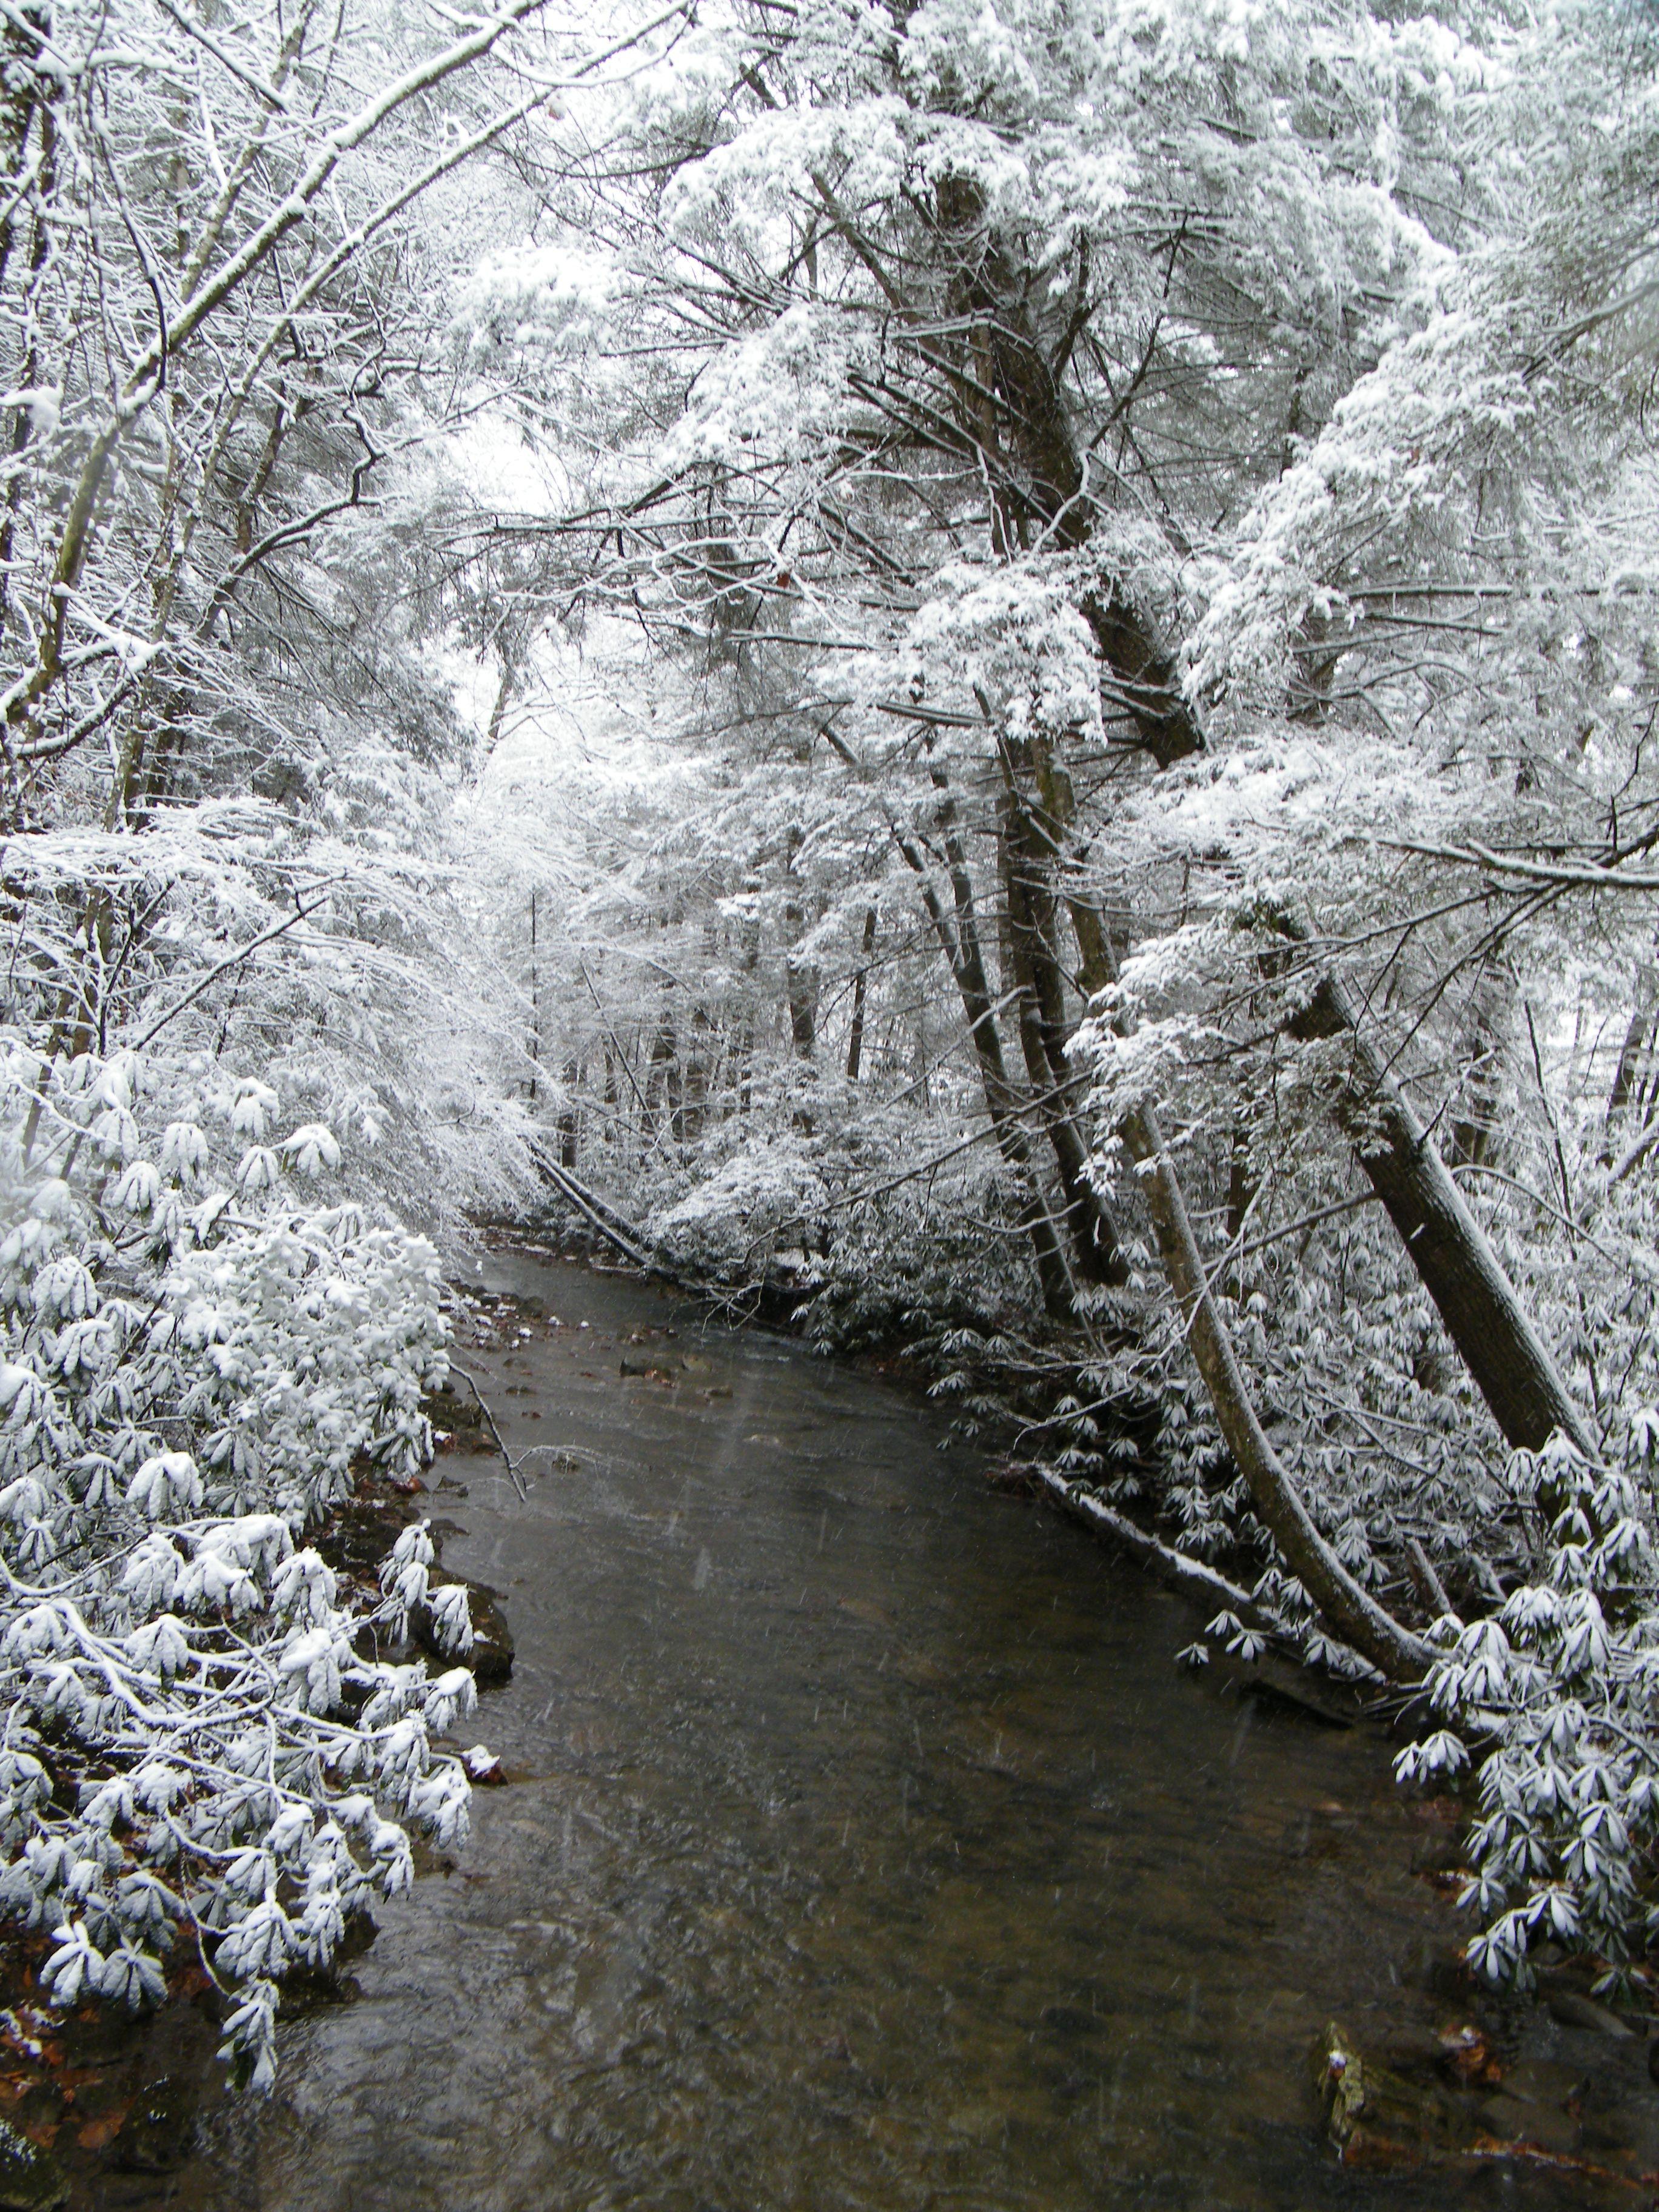 Wild River - Martin's Fork, KY